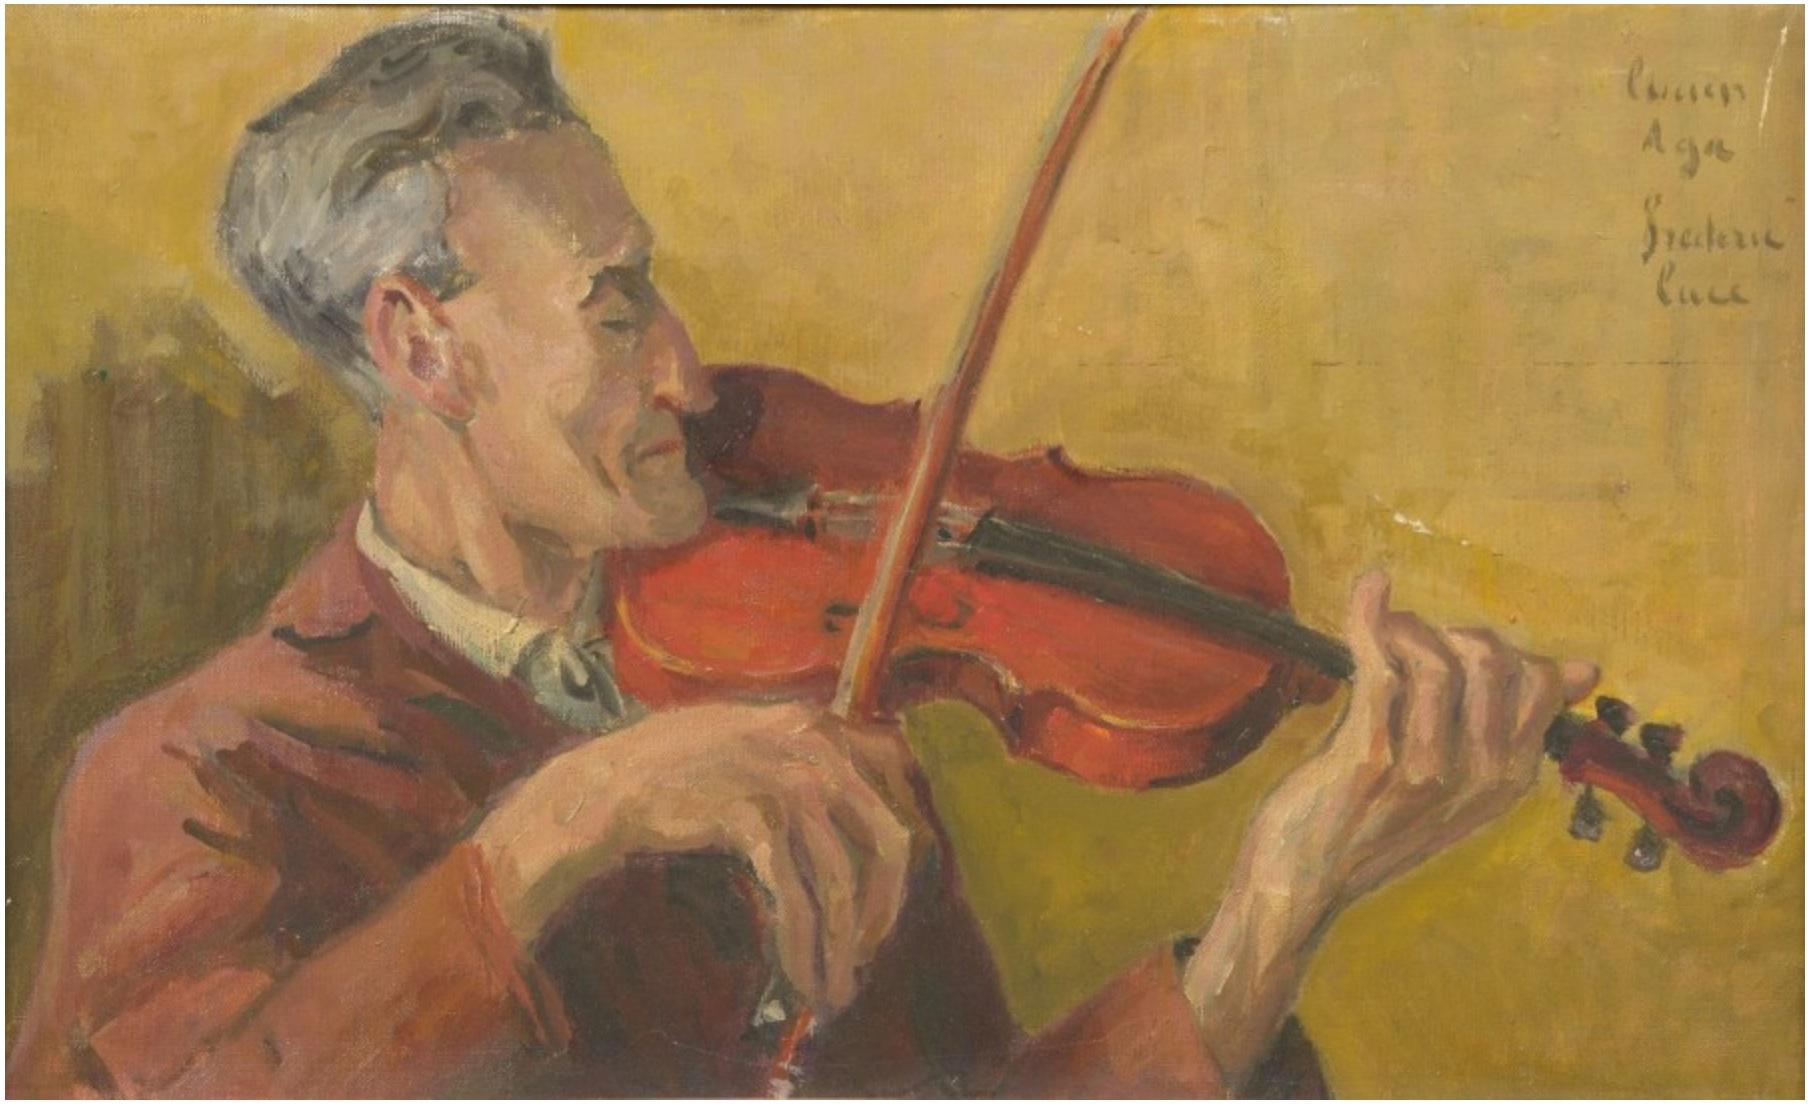 Lucien-Aga-violoniste_OgerBlanchet